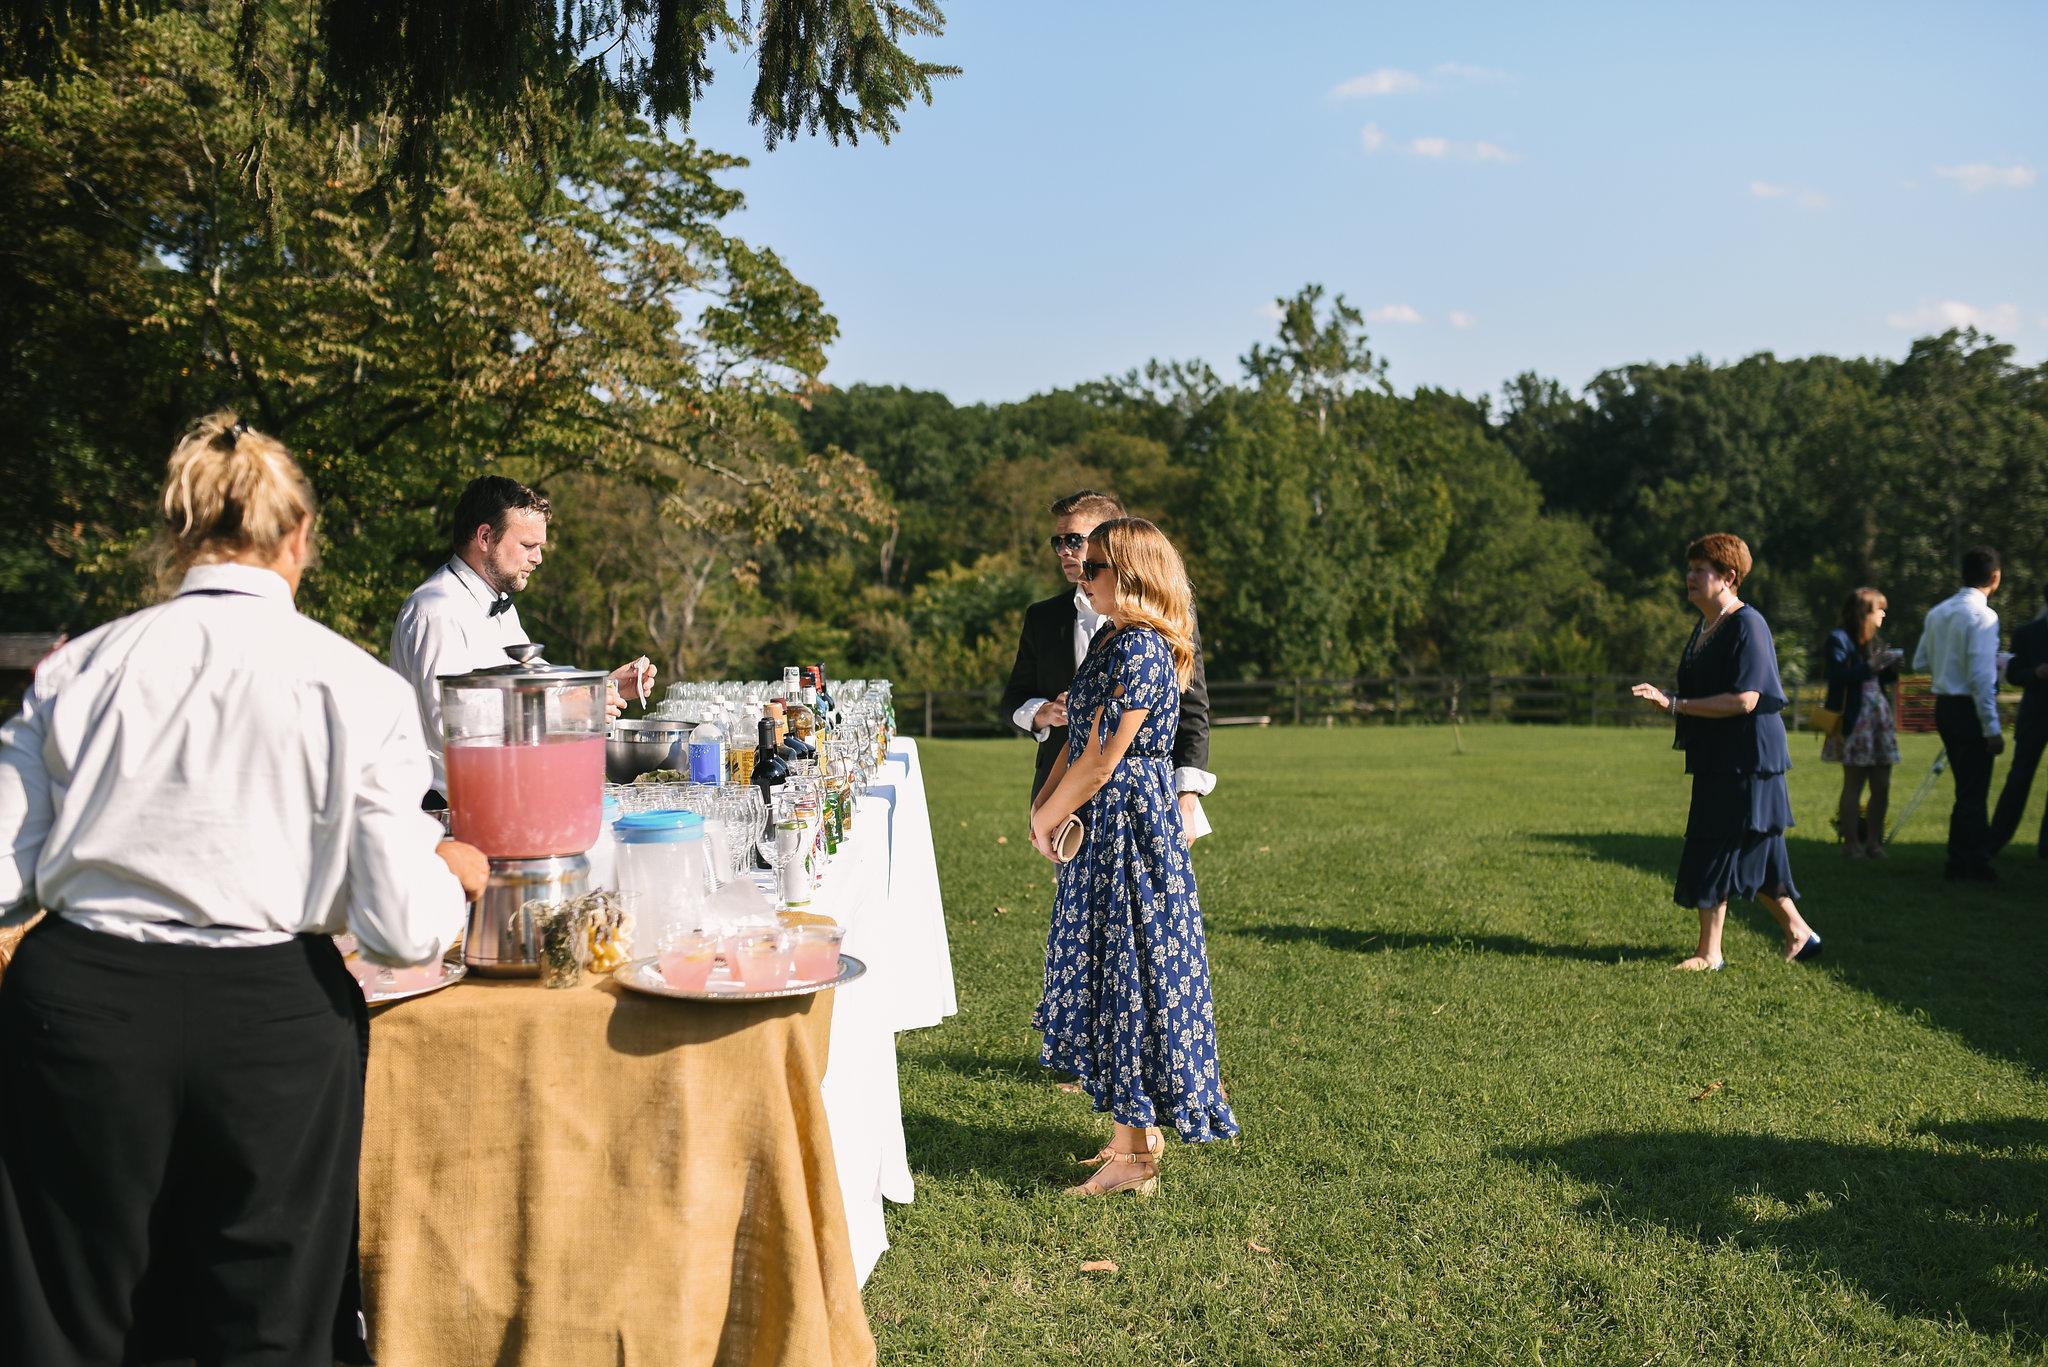 Maryland, Eastern Shore, Baltimore Wedding Photographer, Romantic, Boho, Backyard Wedding, Nature, Wedding Guests Getting Drinks at Reception Bar, Outdoor Reception